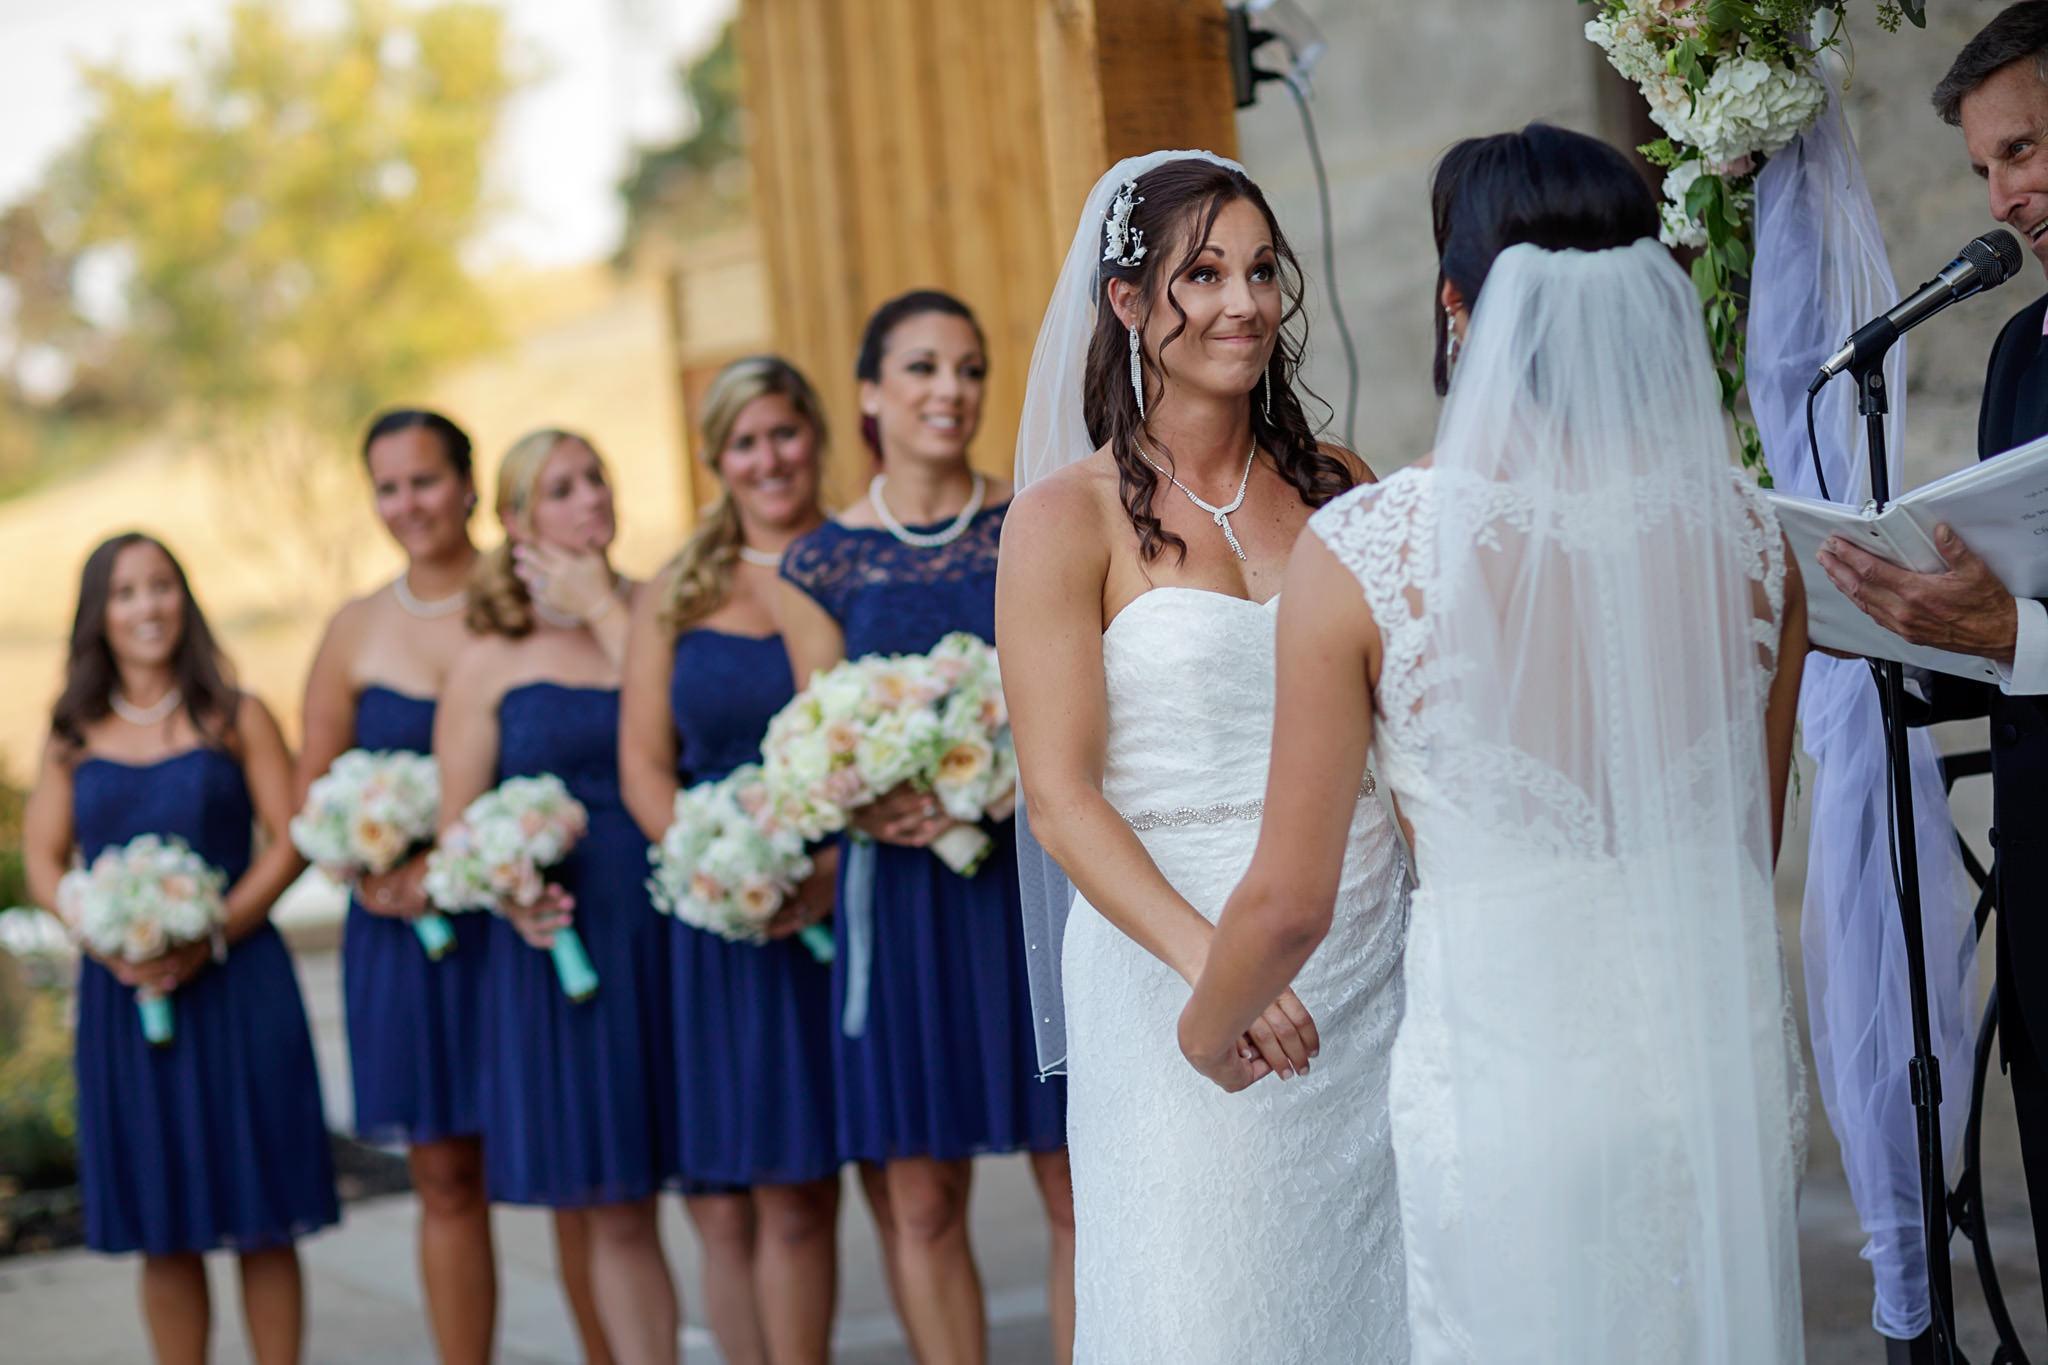 15-karli-christina-livermore-wedding-murrietas-well